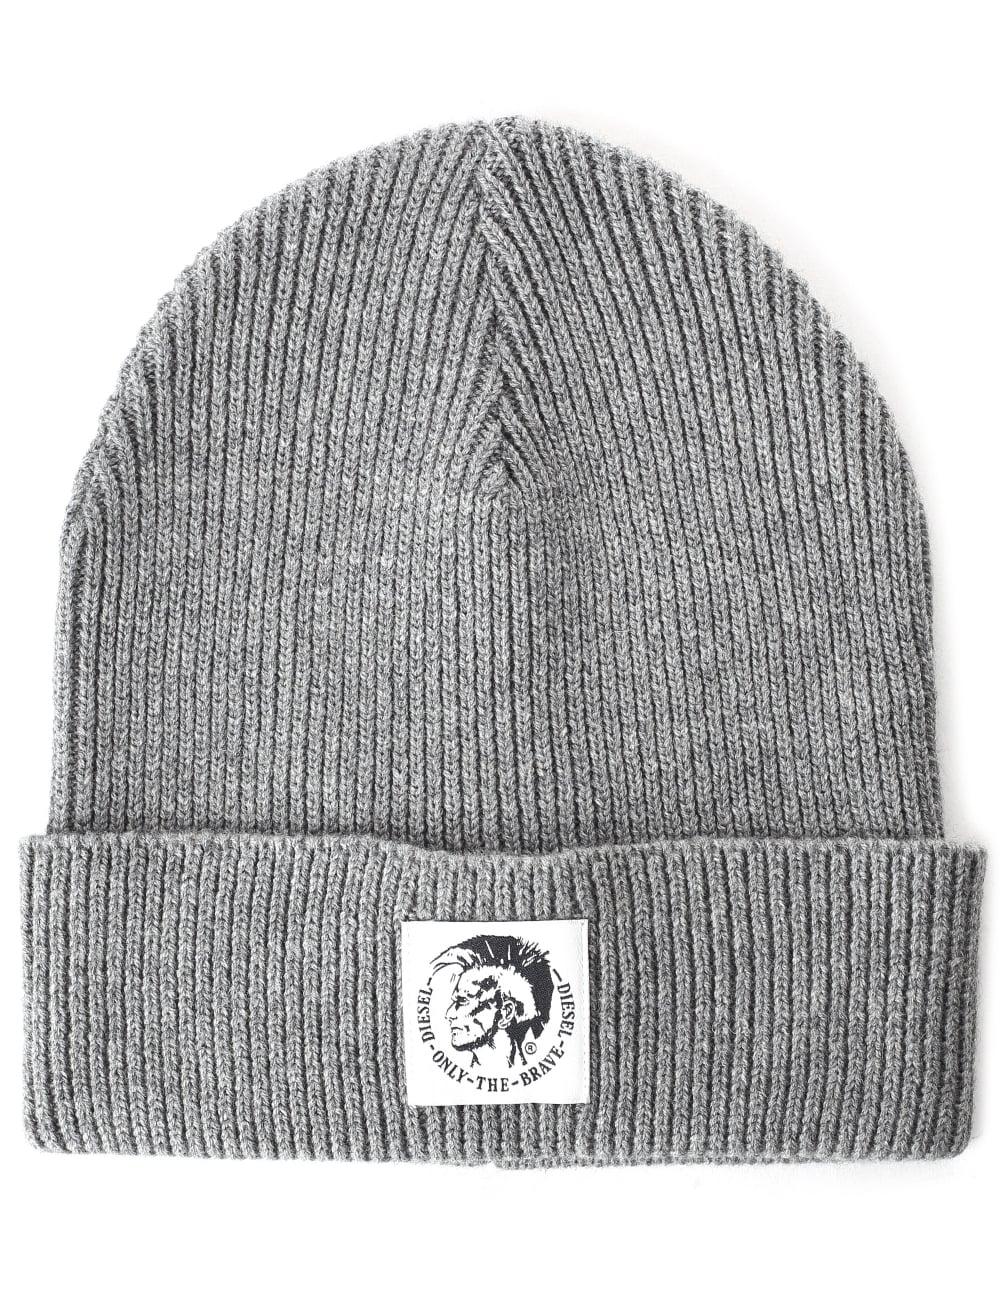 Diesel Men s K-Coder Mohawk Logo Beanie Hat 59994f00918